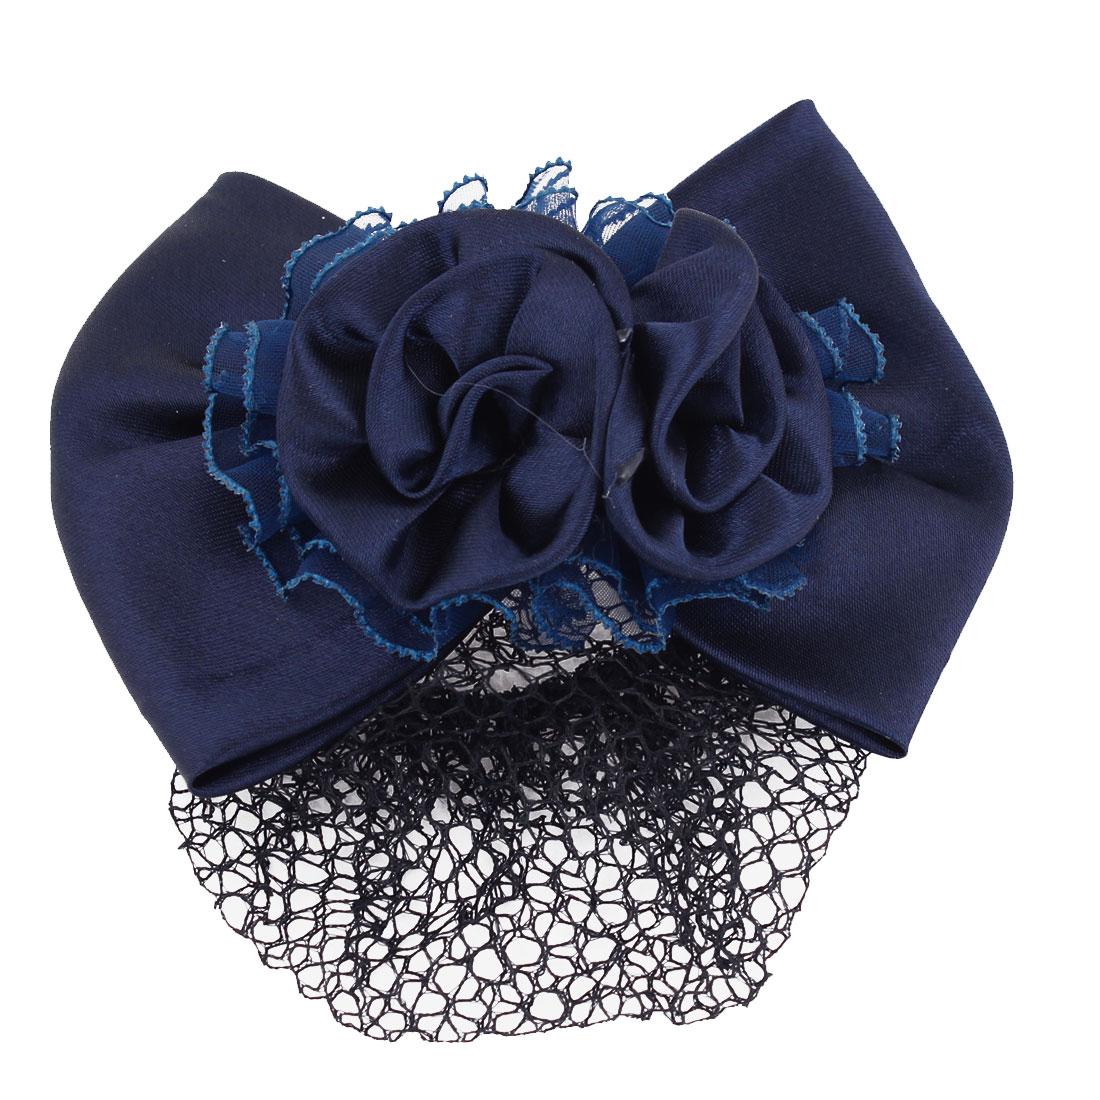 Navy Blue Double Rose Decor Snood Net Hair Clip Hairnet Hairclip for Women